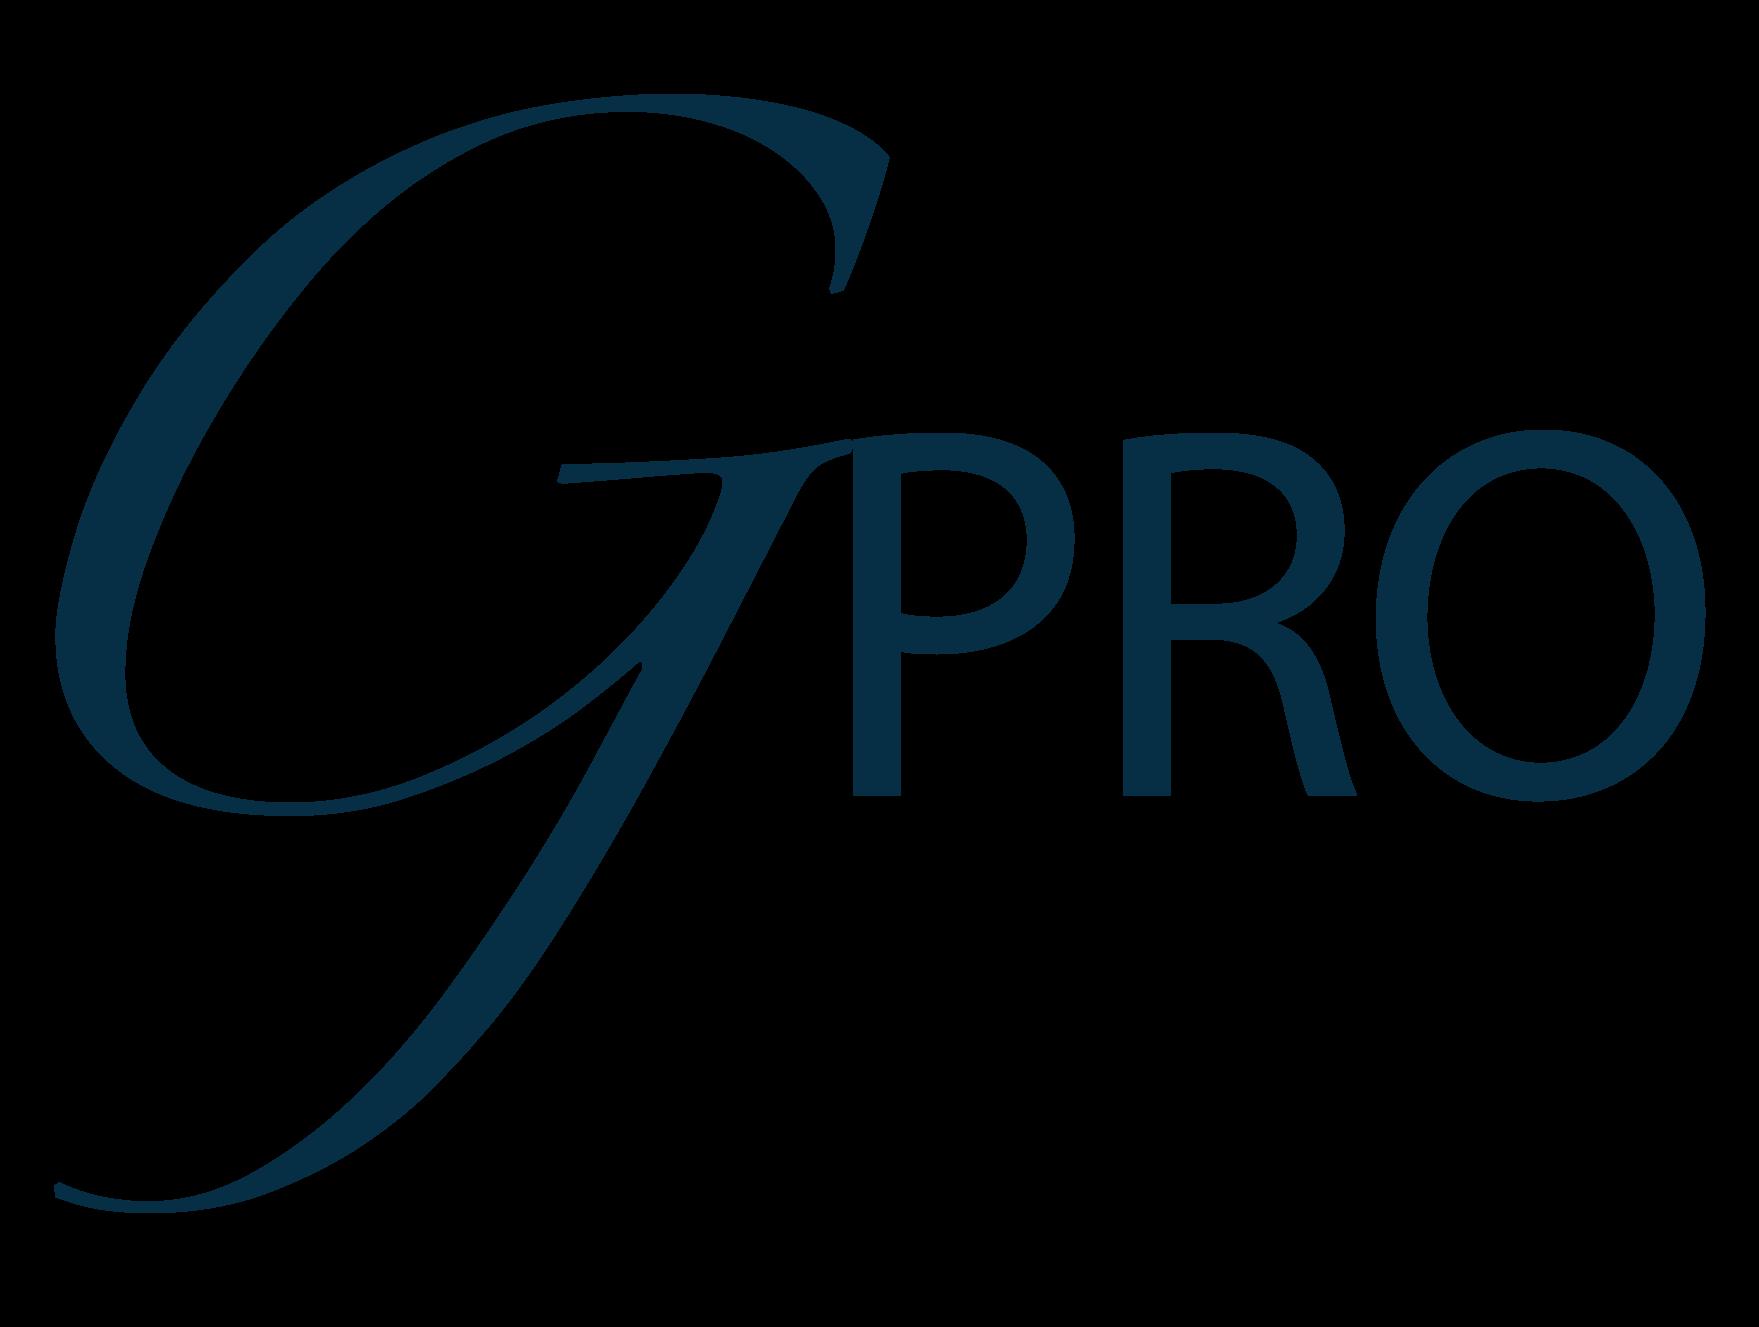 Gpro Digital Media (Gaston Productions)